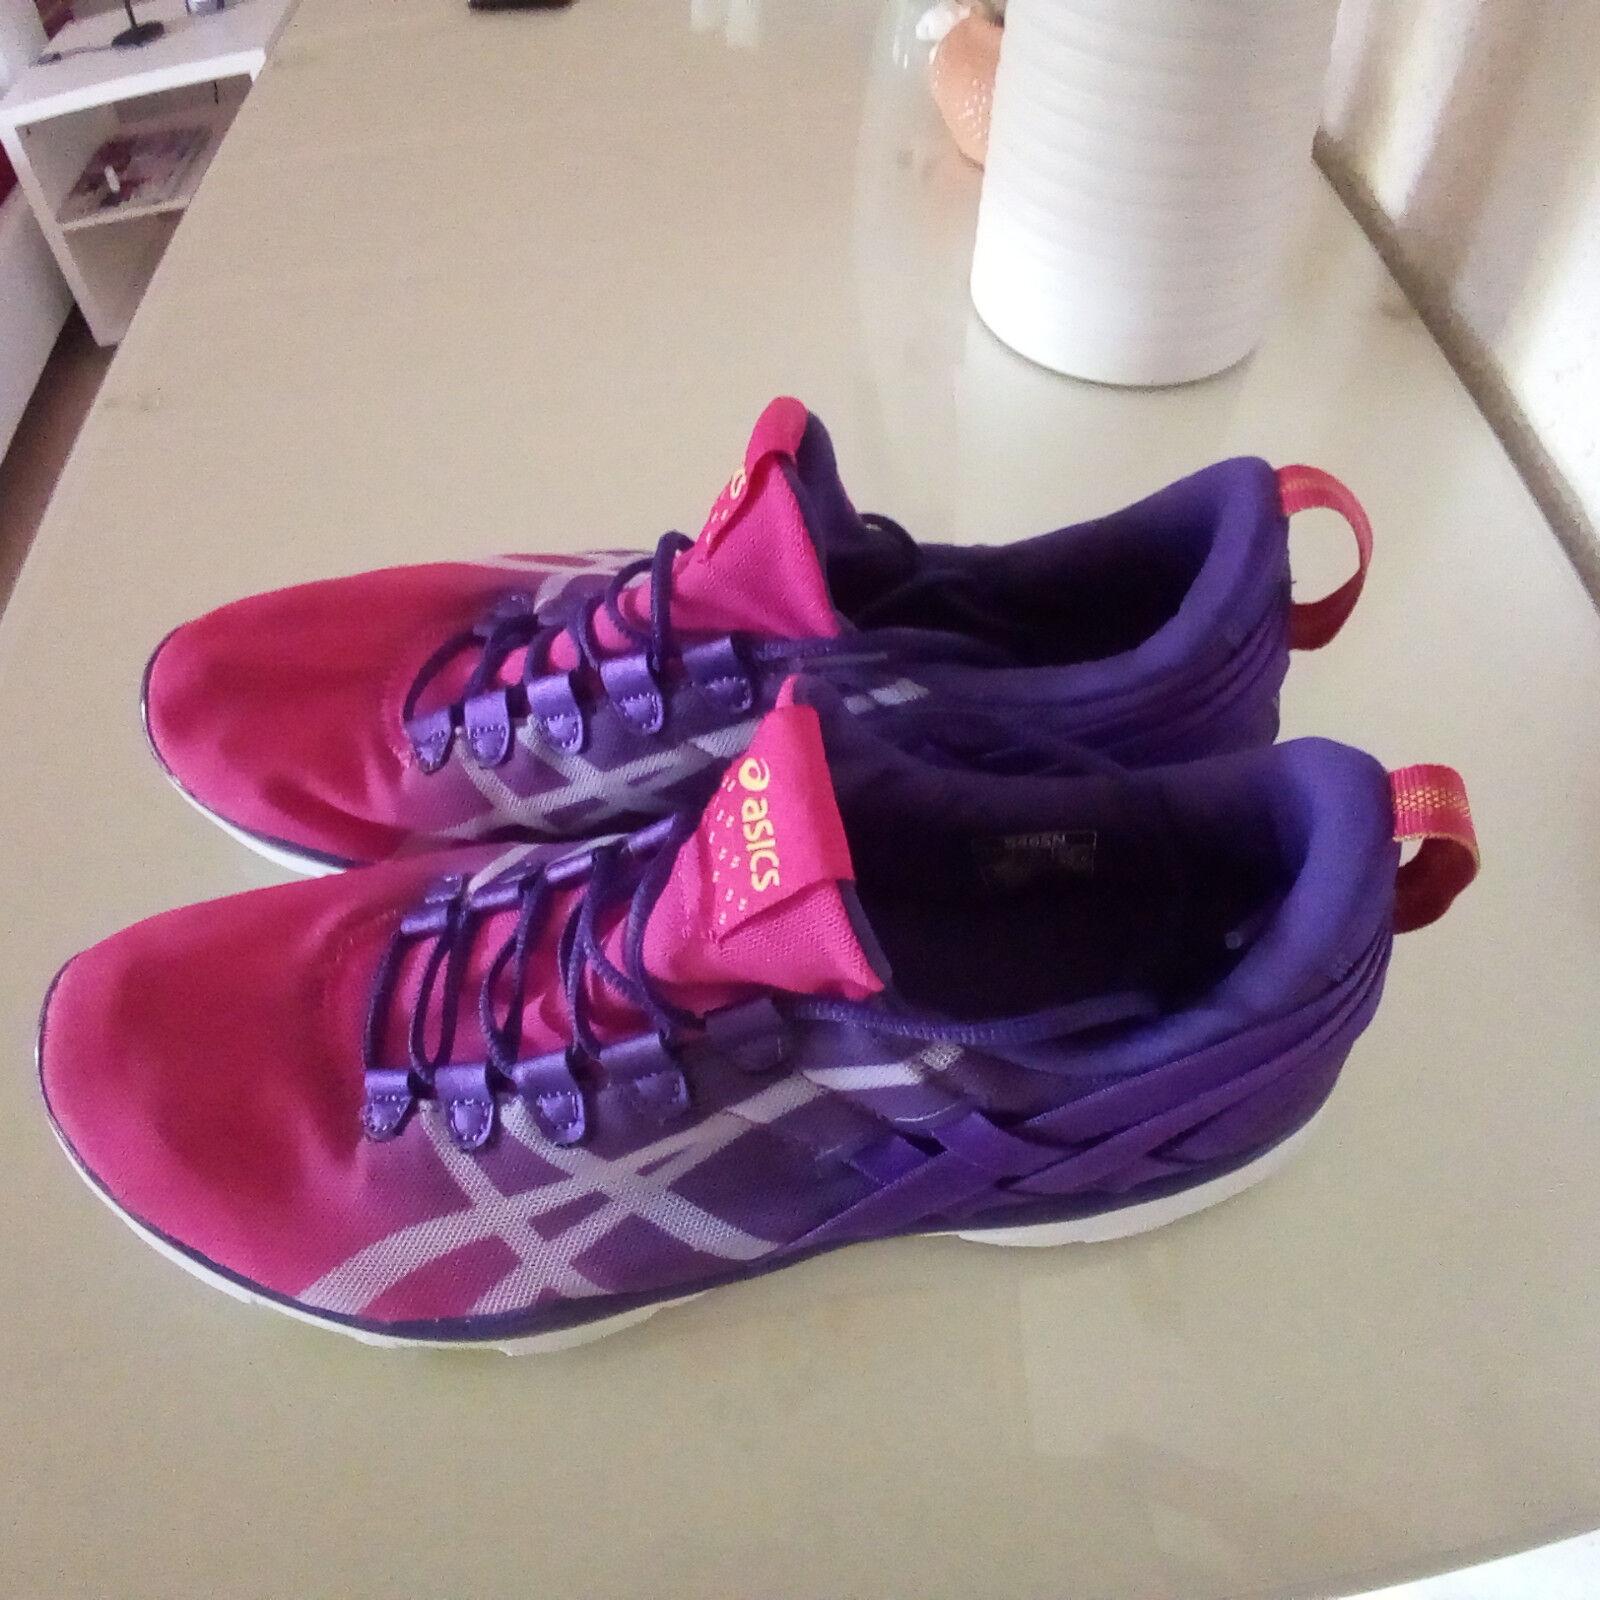 ASICS Fitness-Schuh Gel Fit Sana, Fitness, Training, Laufschuh, pink, 42,5